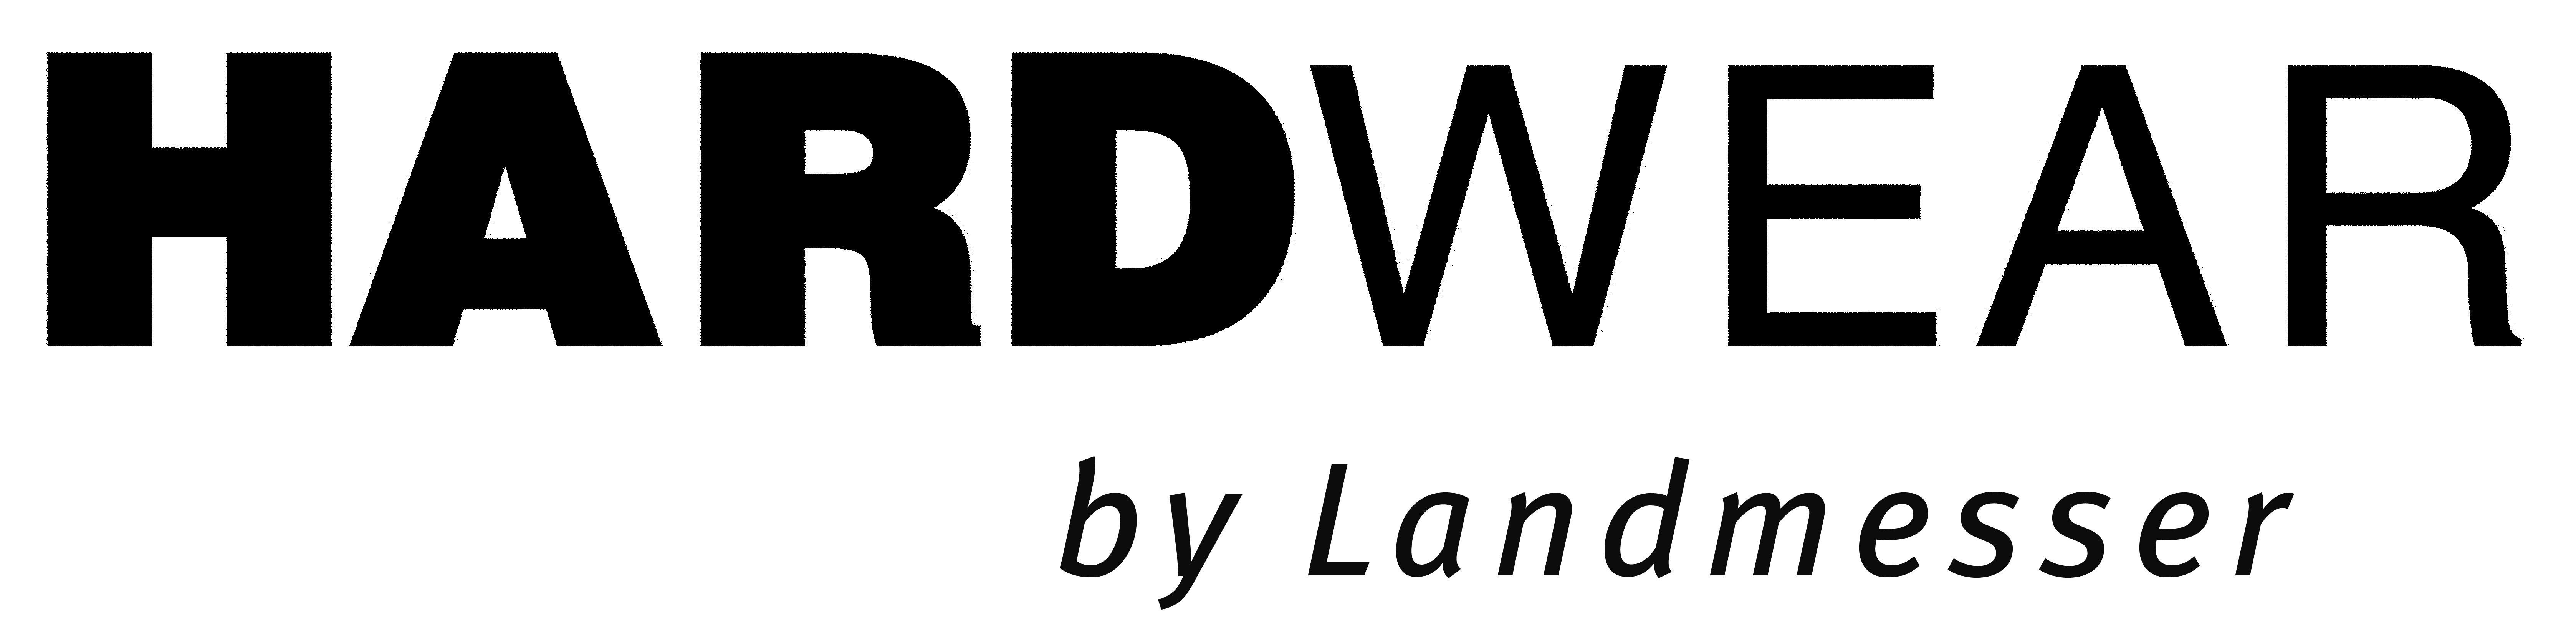 Landmesser OHG